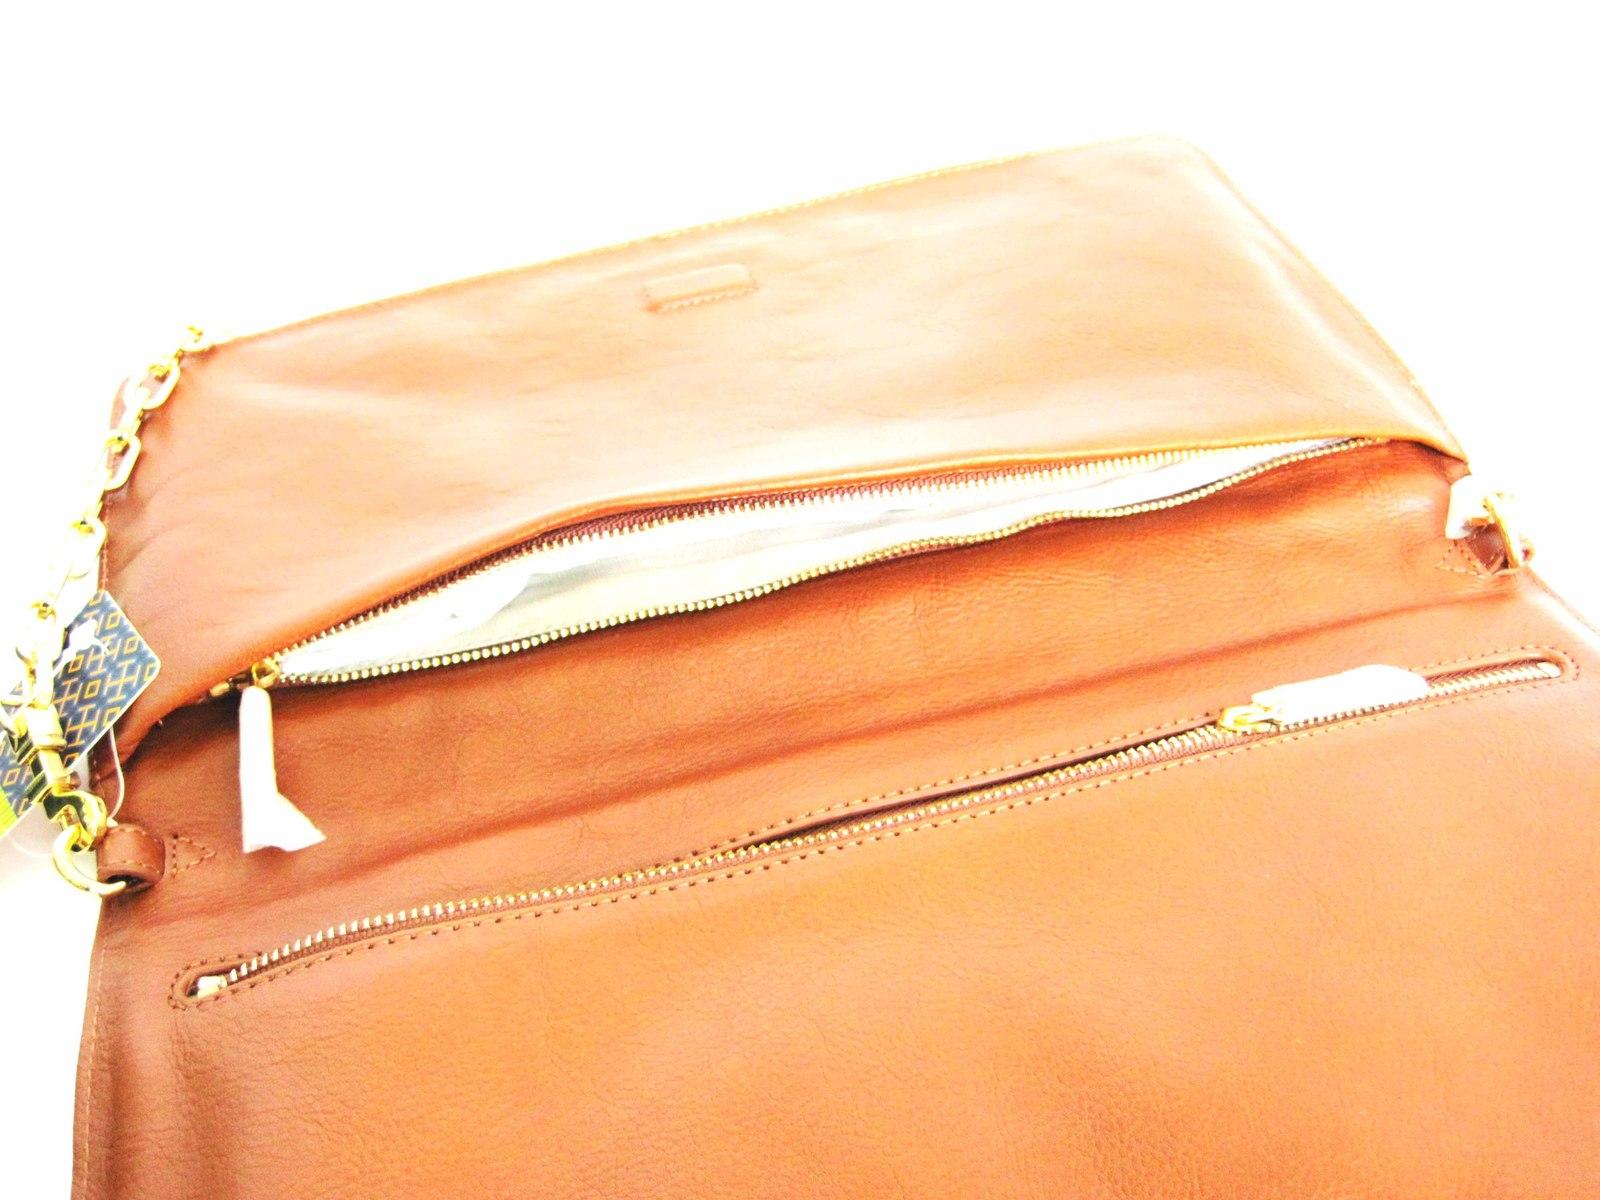 Tory Burch SUKI REVA Clutch Purse Shoulder Handbag Brown image 6